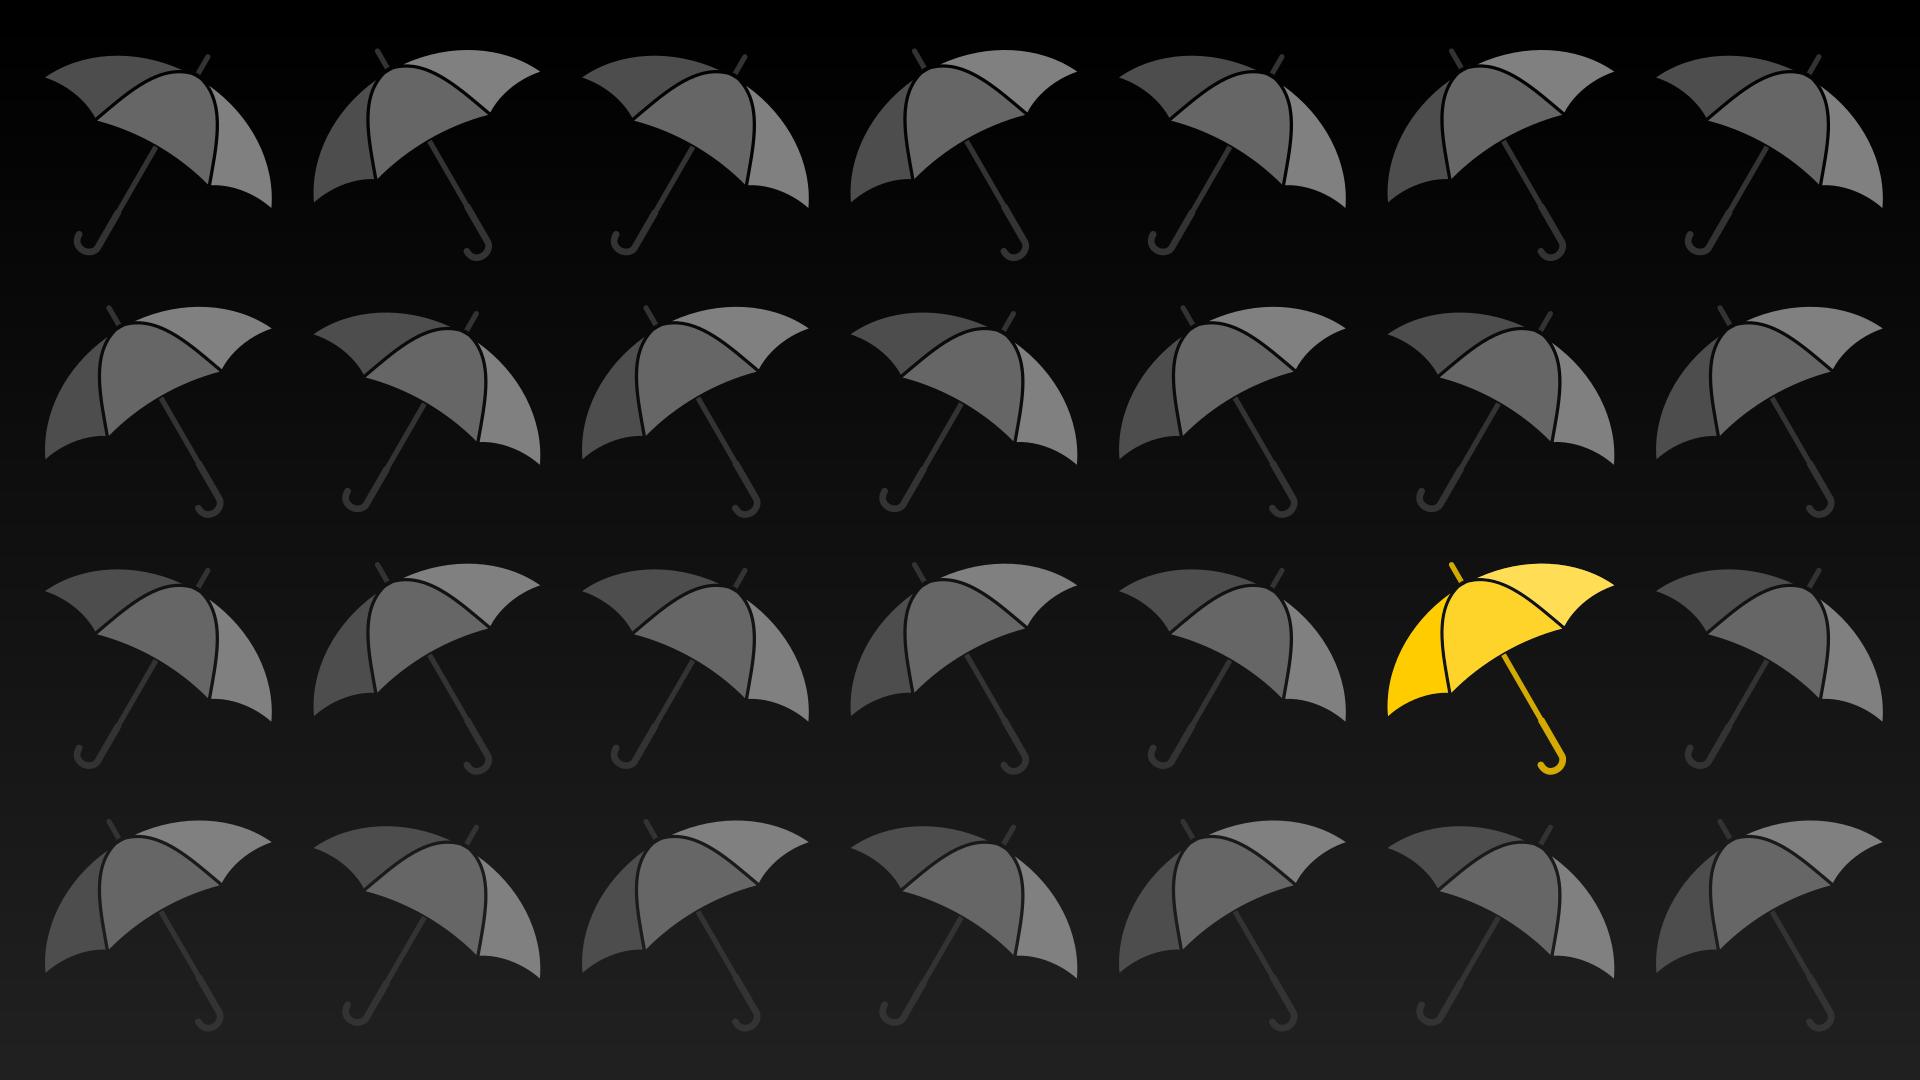 Wallpaper How I Met Your Mother Umbrella Yellow Umbrella Ted